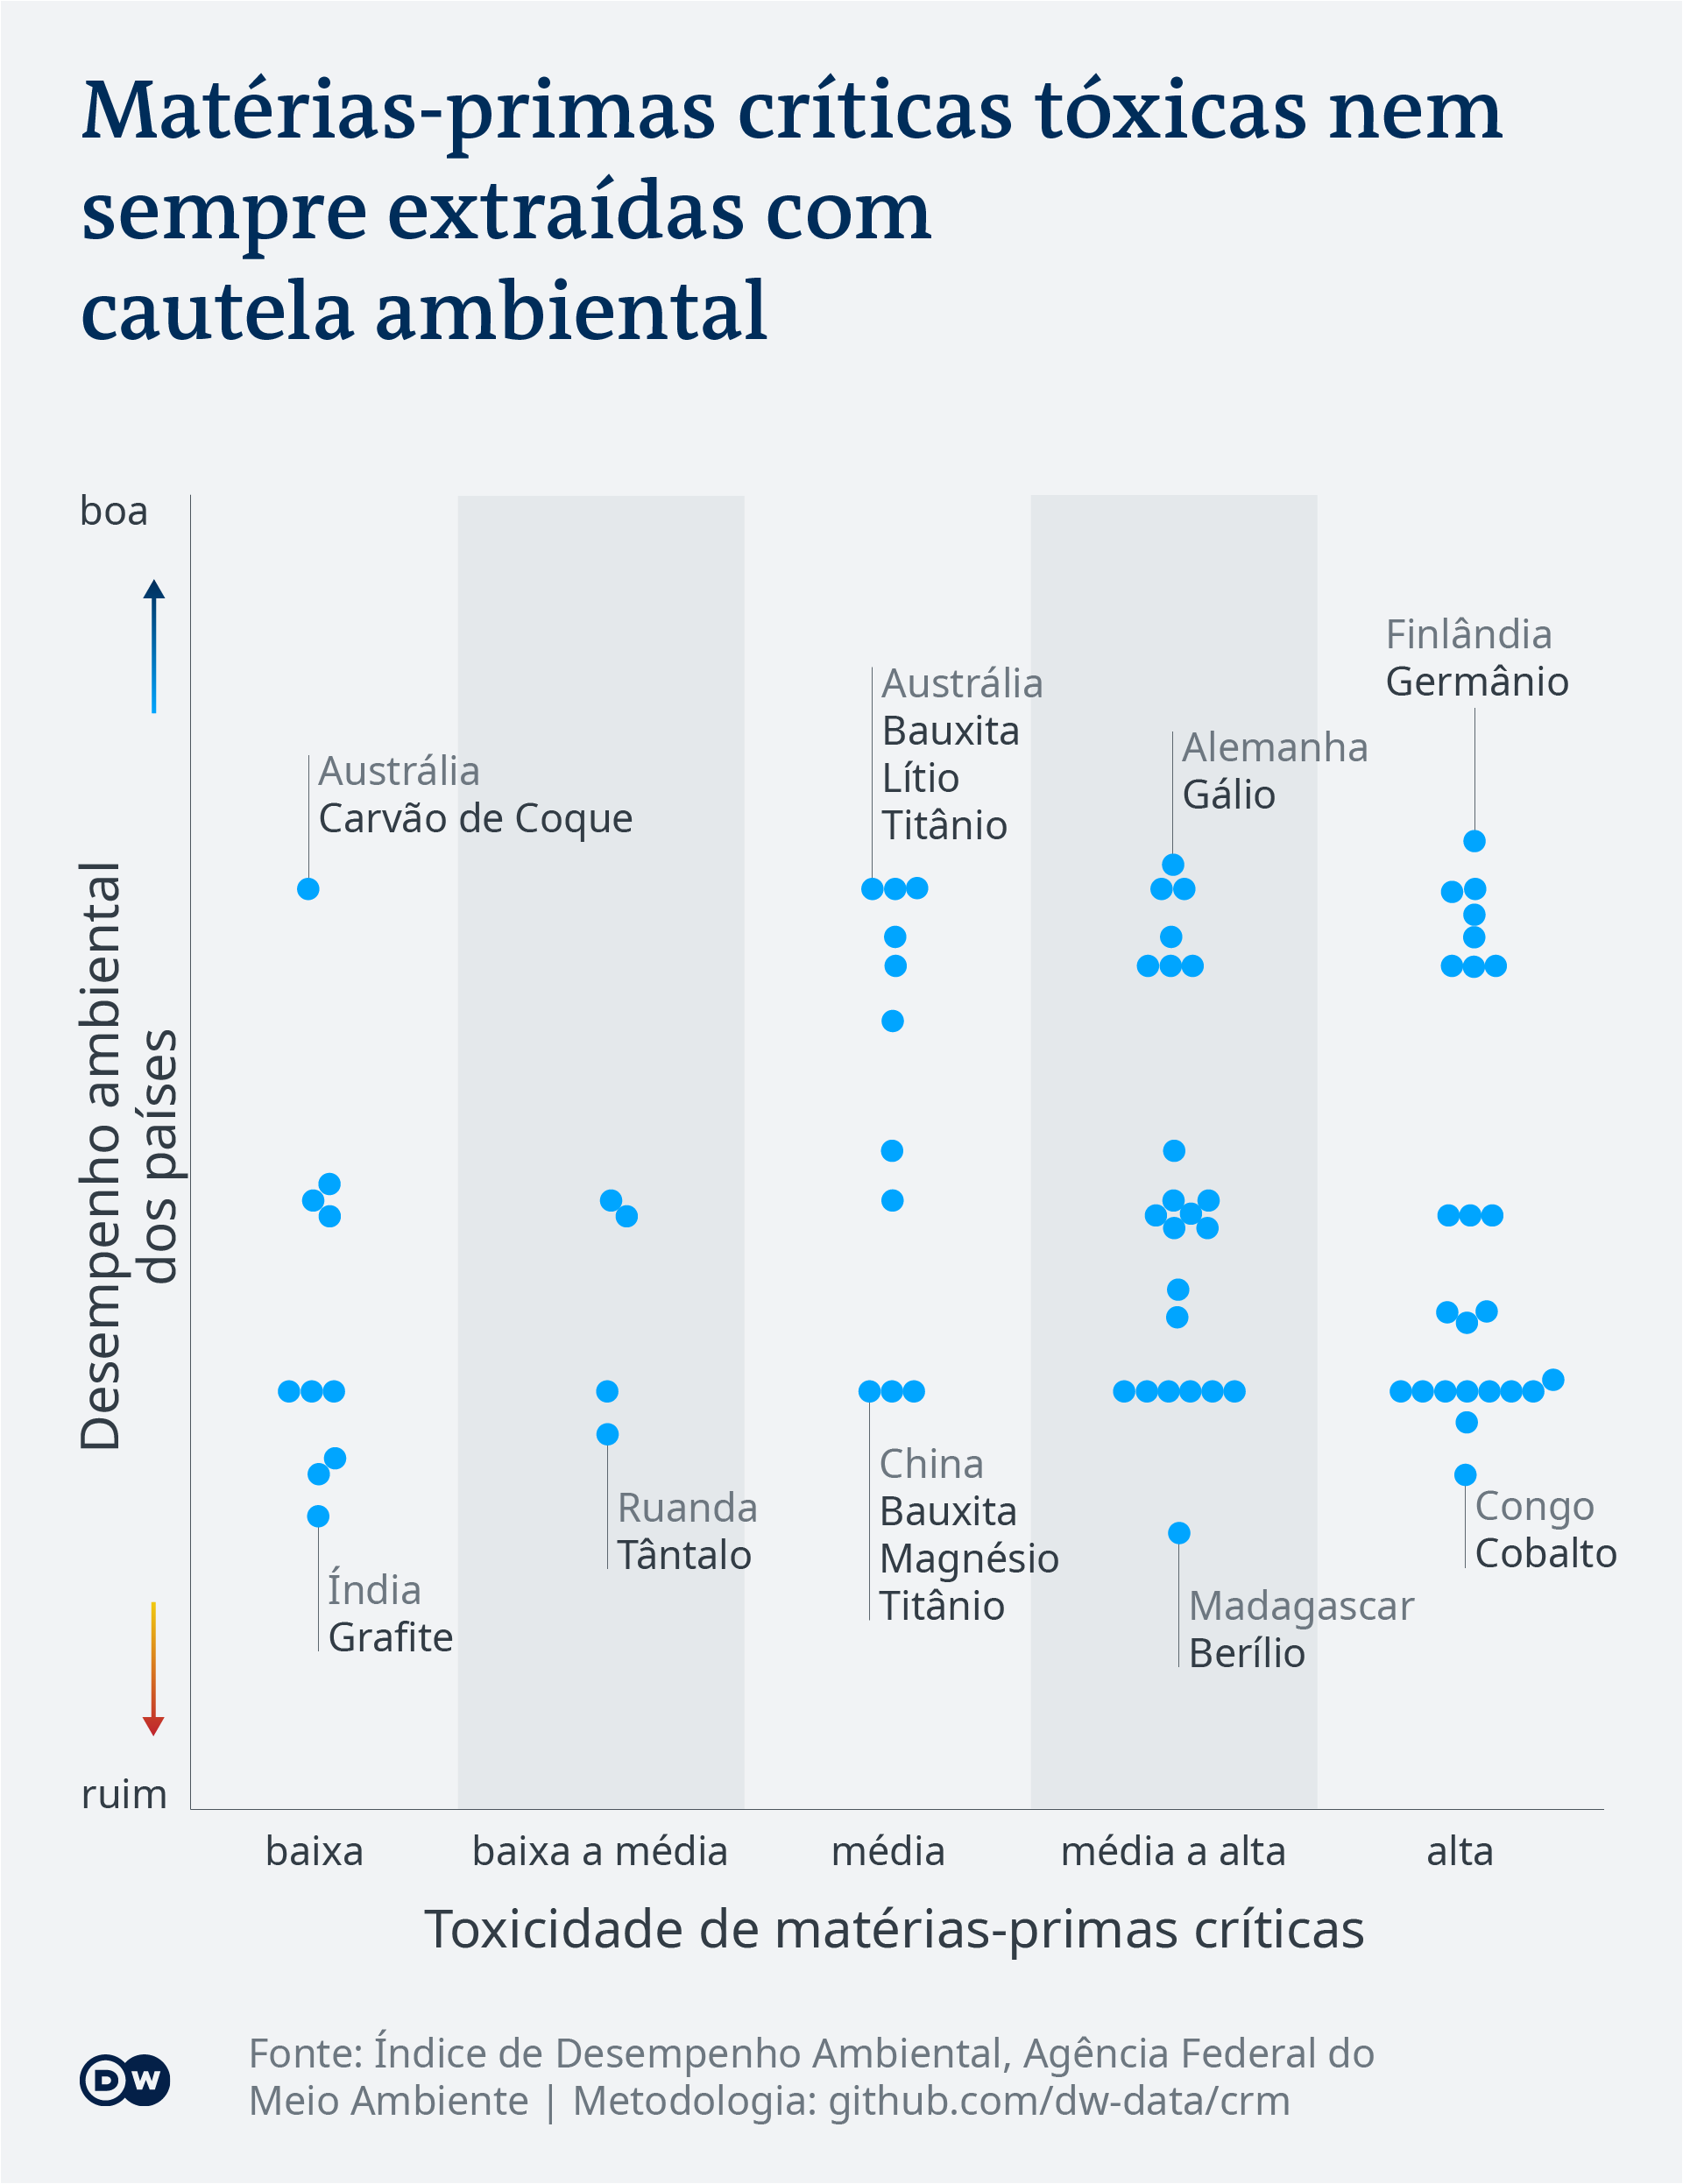 Data visualization: Toxicity of critical raw materials - Portuguese (Brazil)